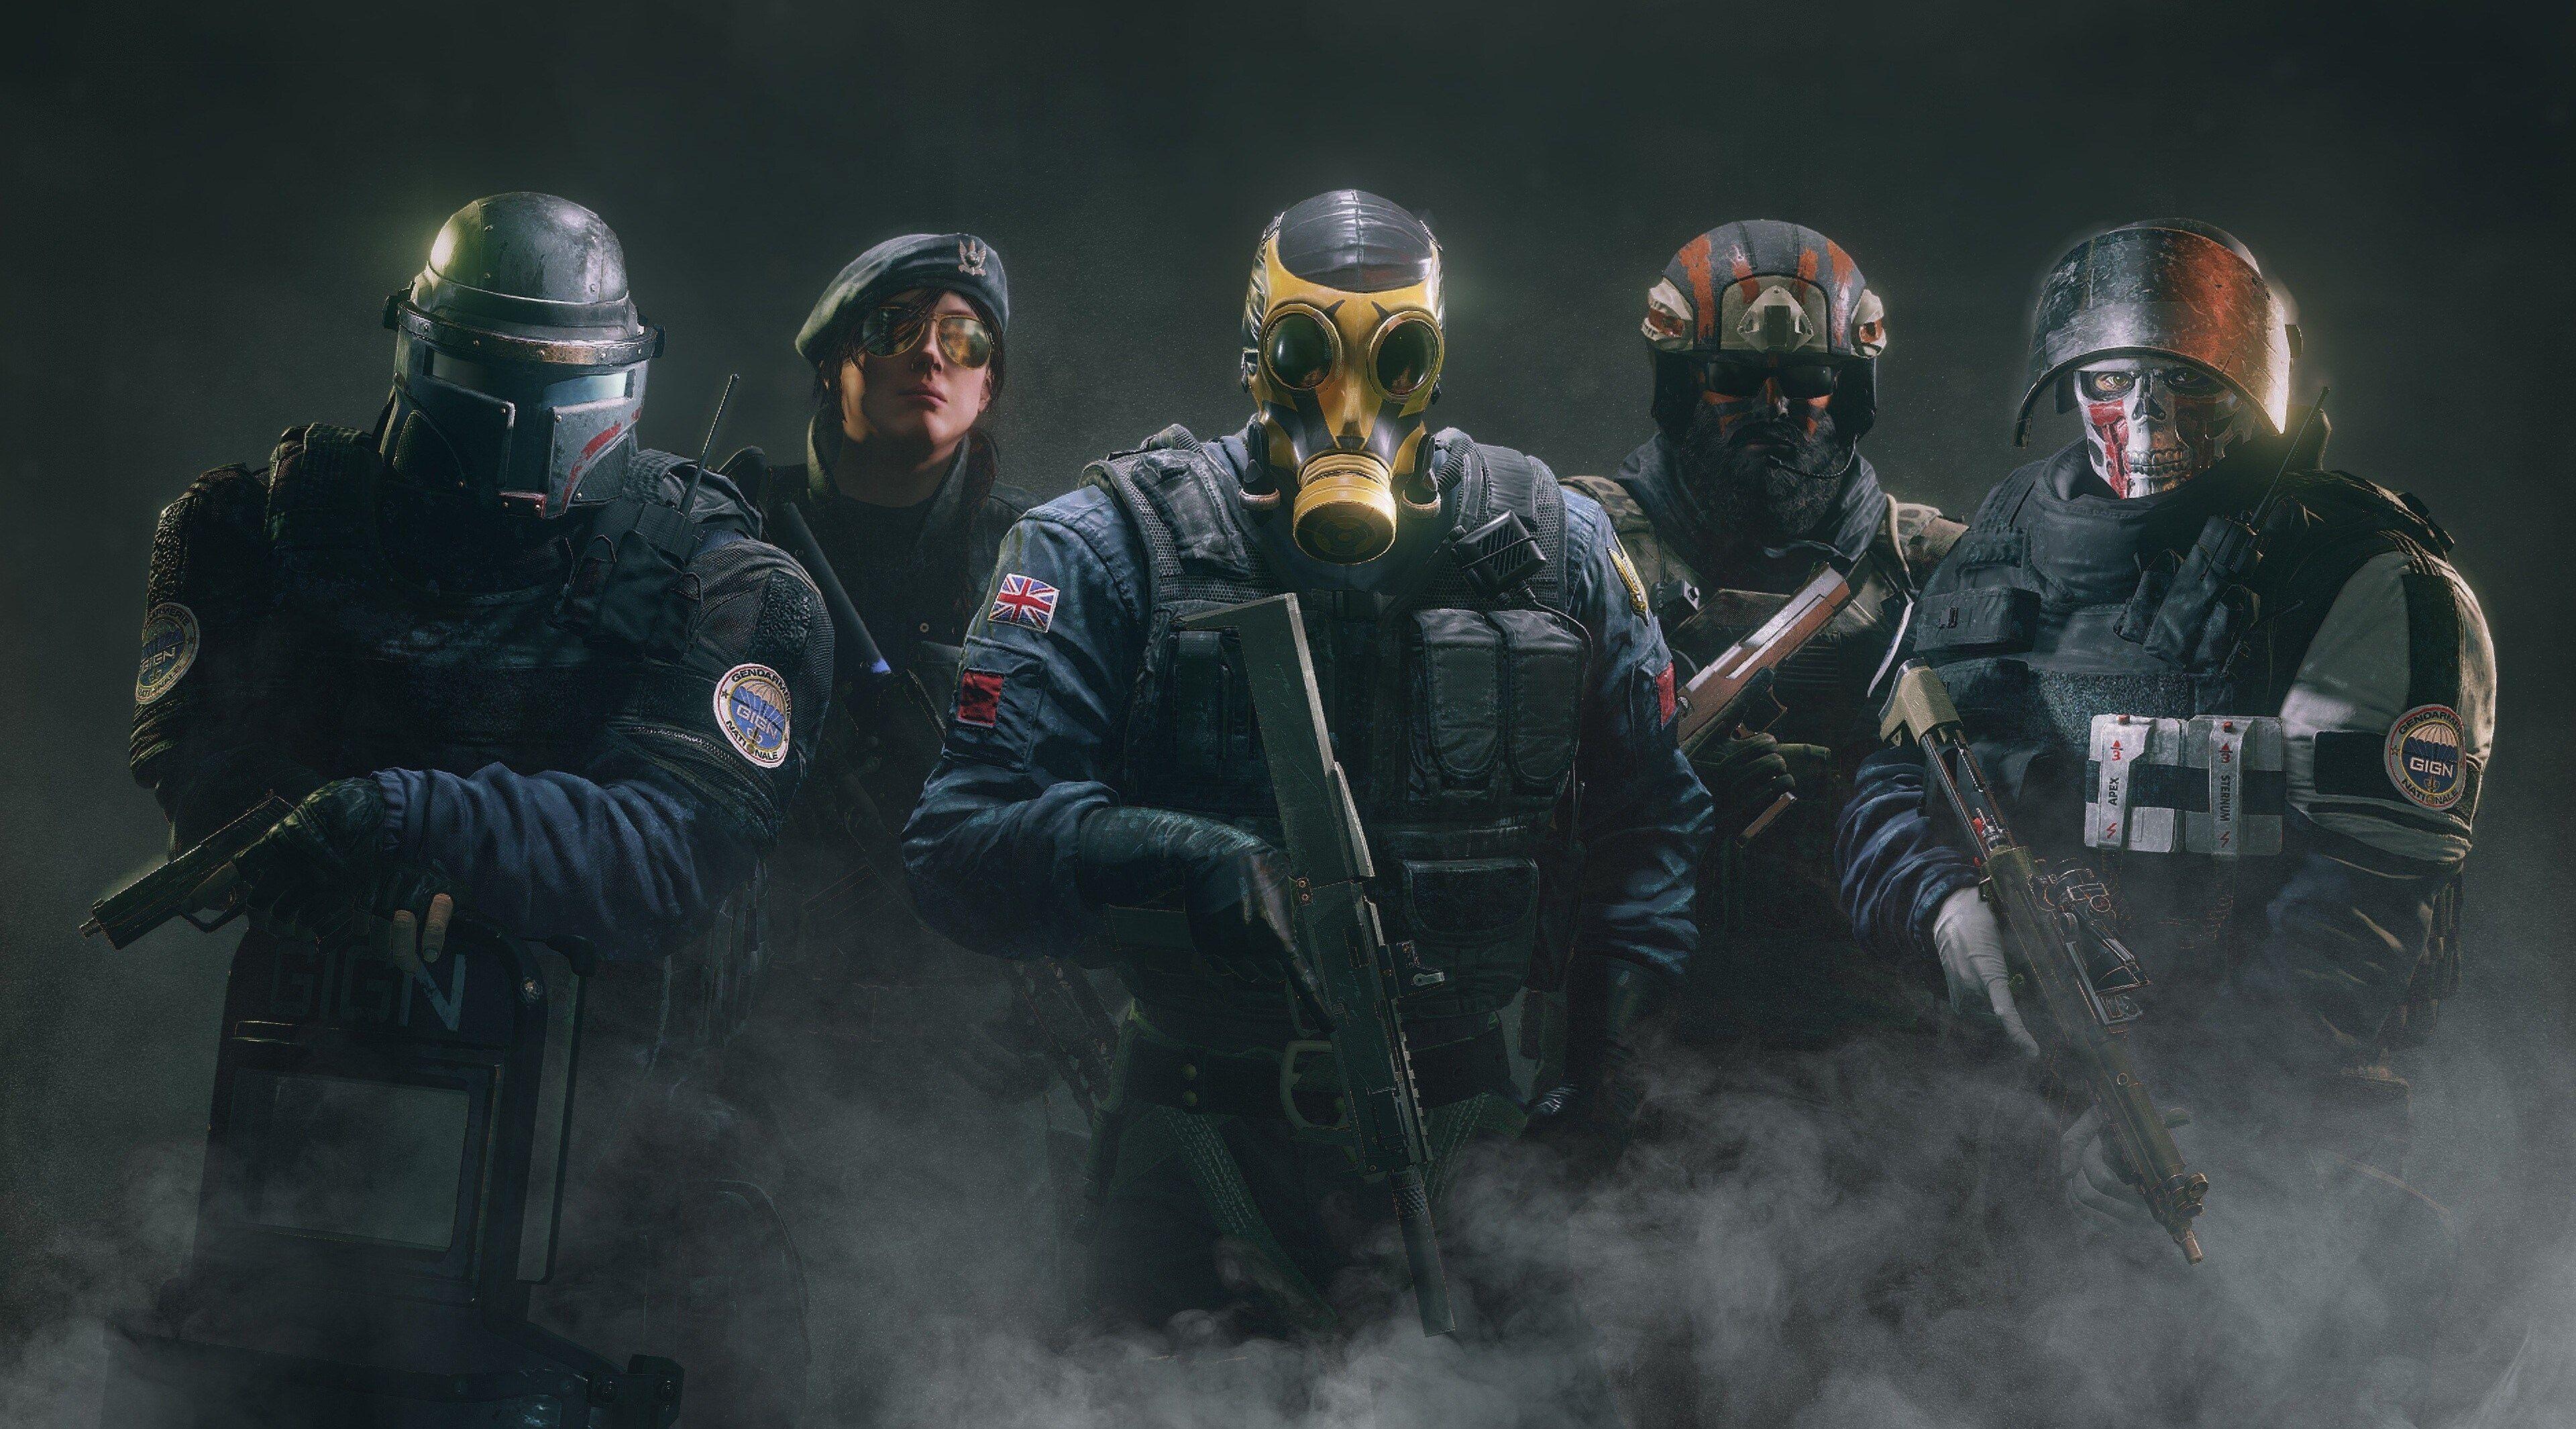 3840x2130 Tom Clancys Rainbow Six Siege 4k Hd Background Wallpaper